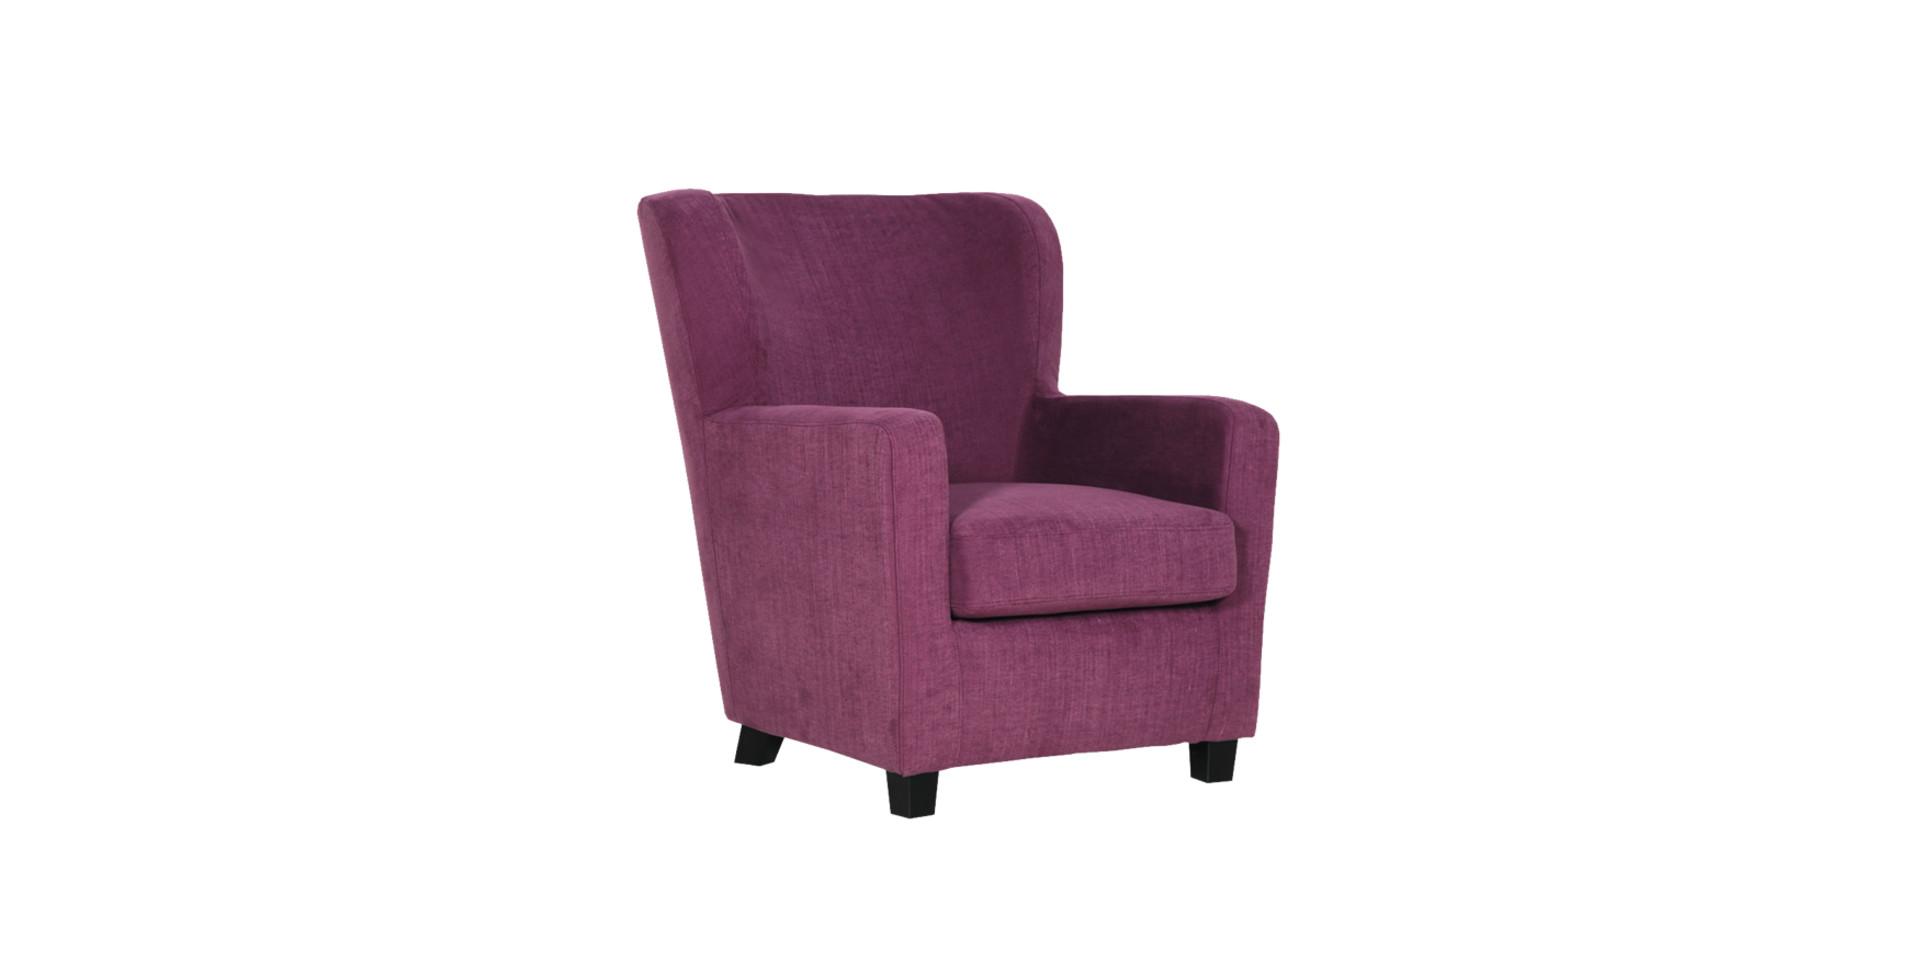 sits-ellen-fauteuil-armchair_caleido1524_aubergine_2